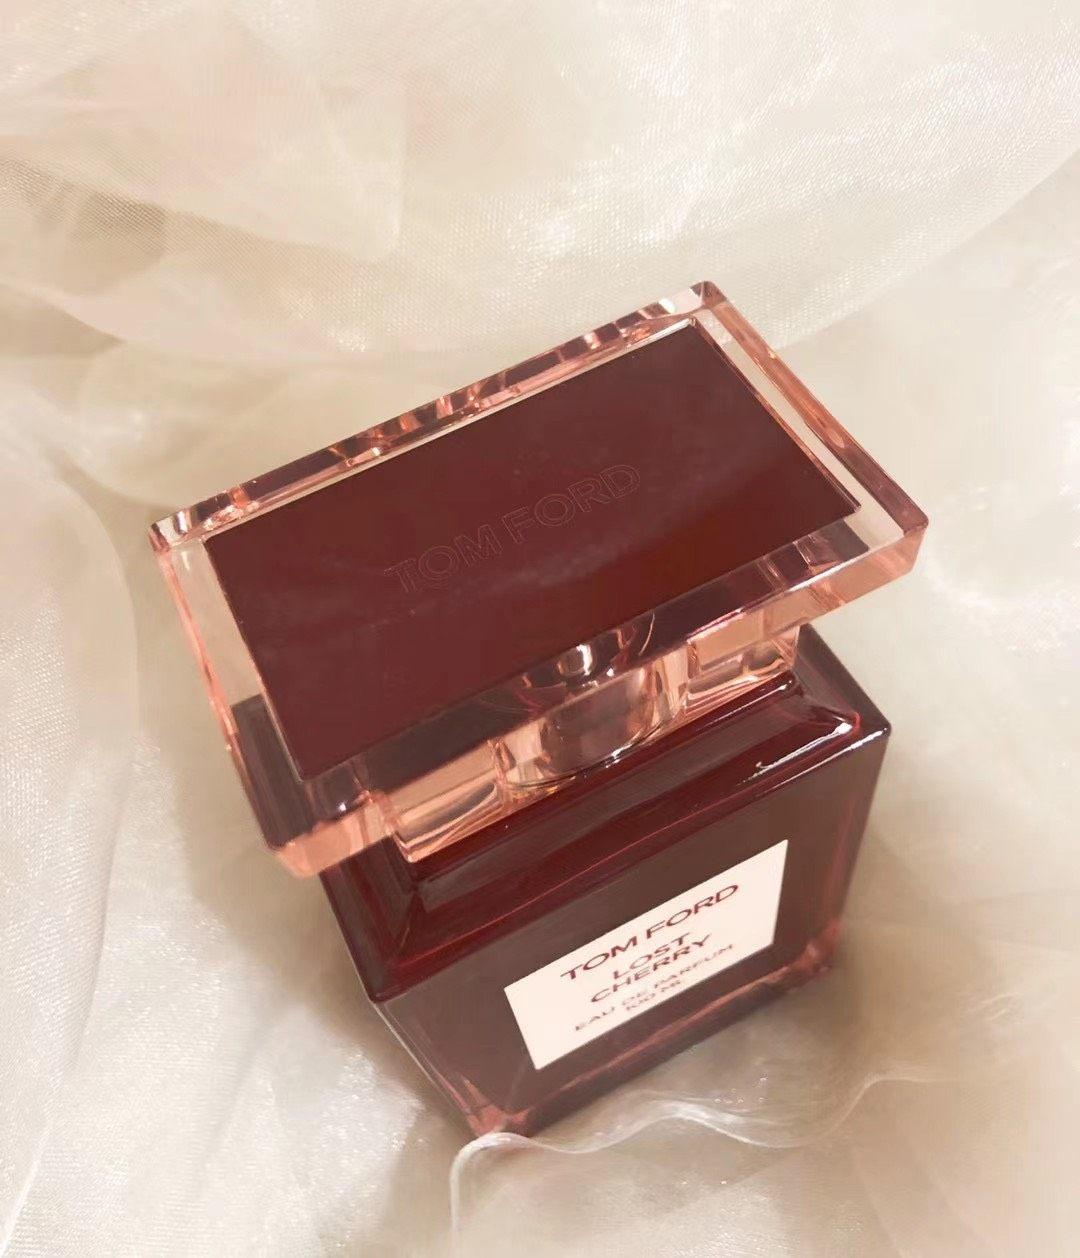 Tf香水折扣又来了 上次卖出去的实拍图,超好看~ 失落的樱桃